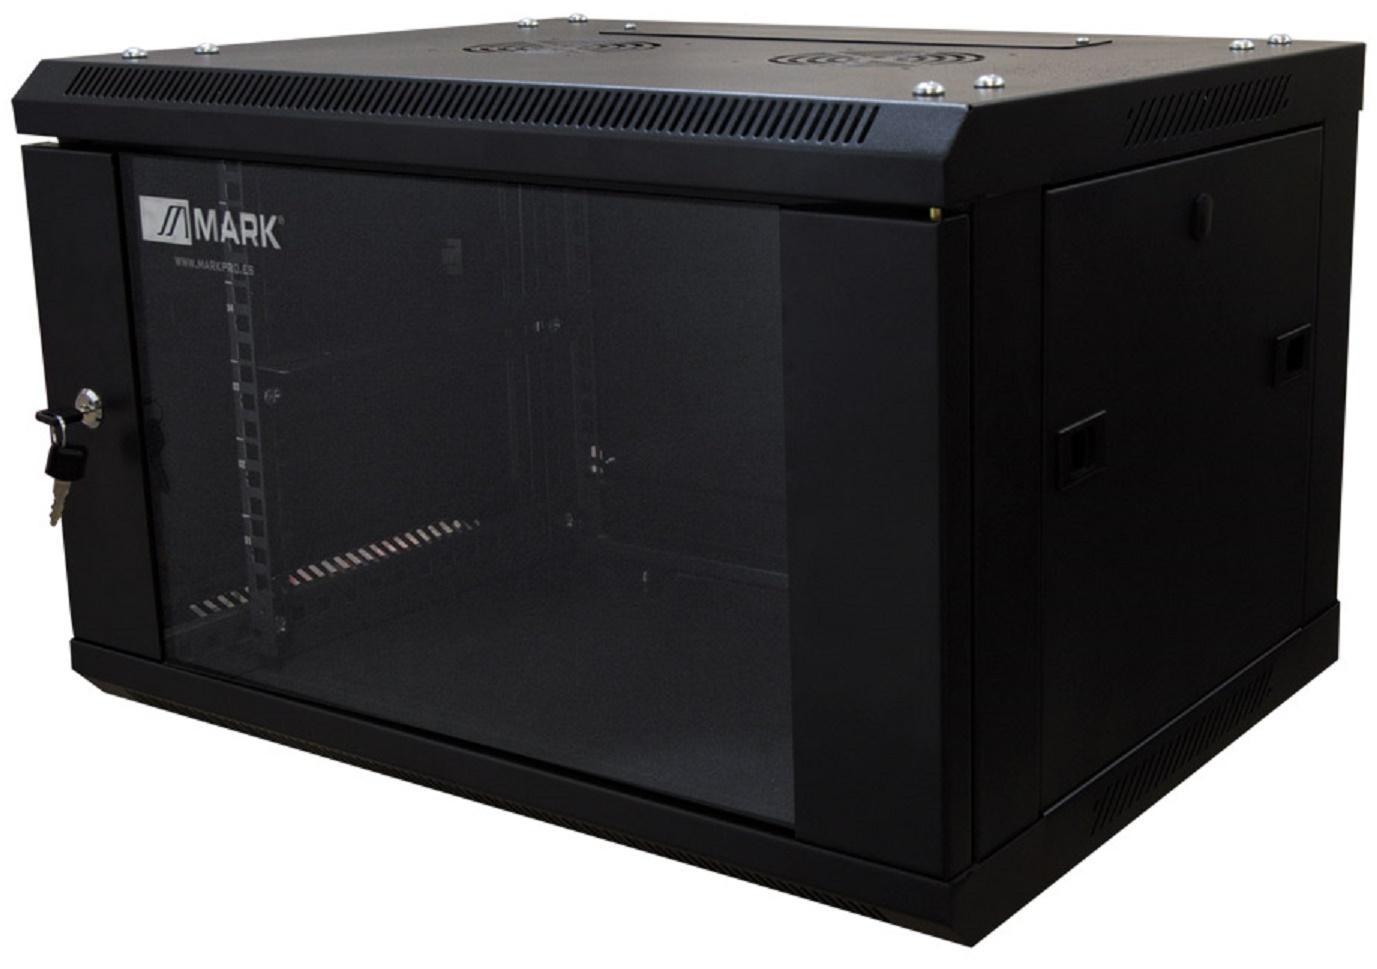 Mark Rmi 9 Pro Rack Metálico